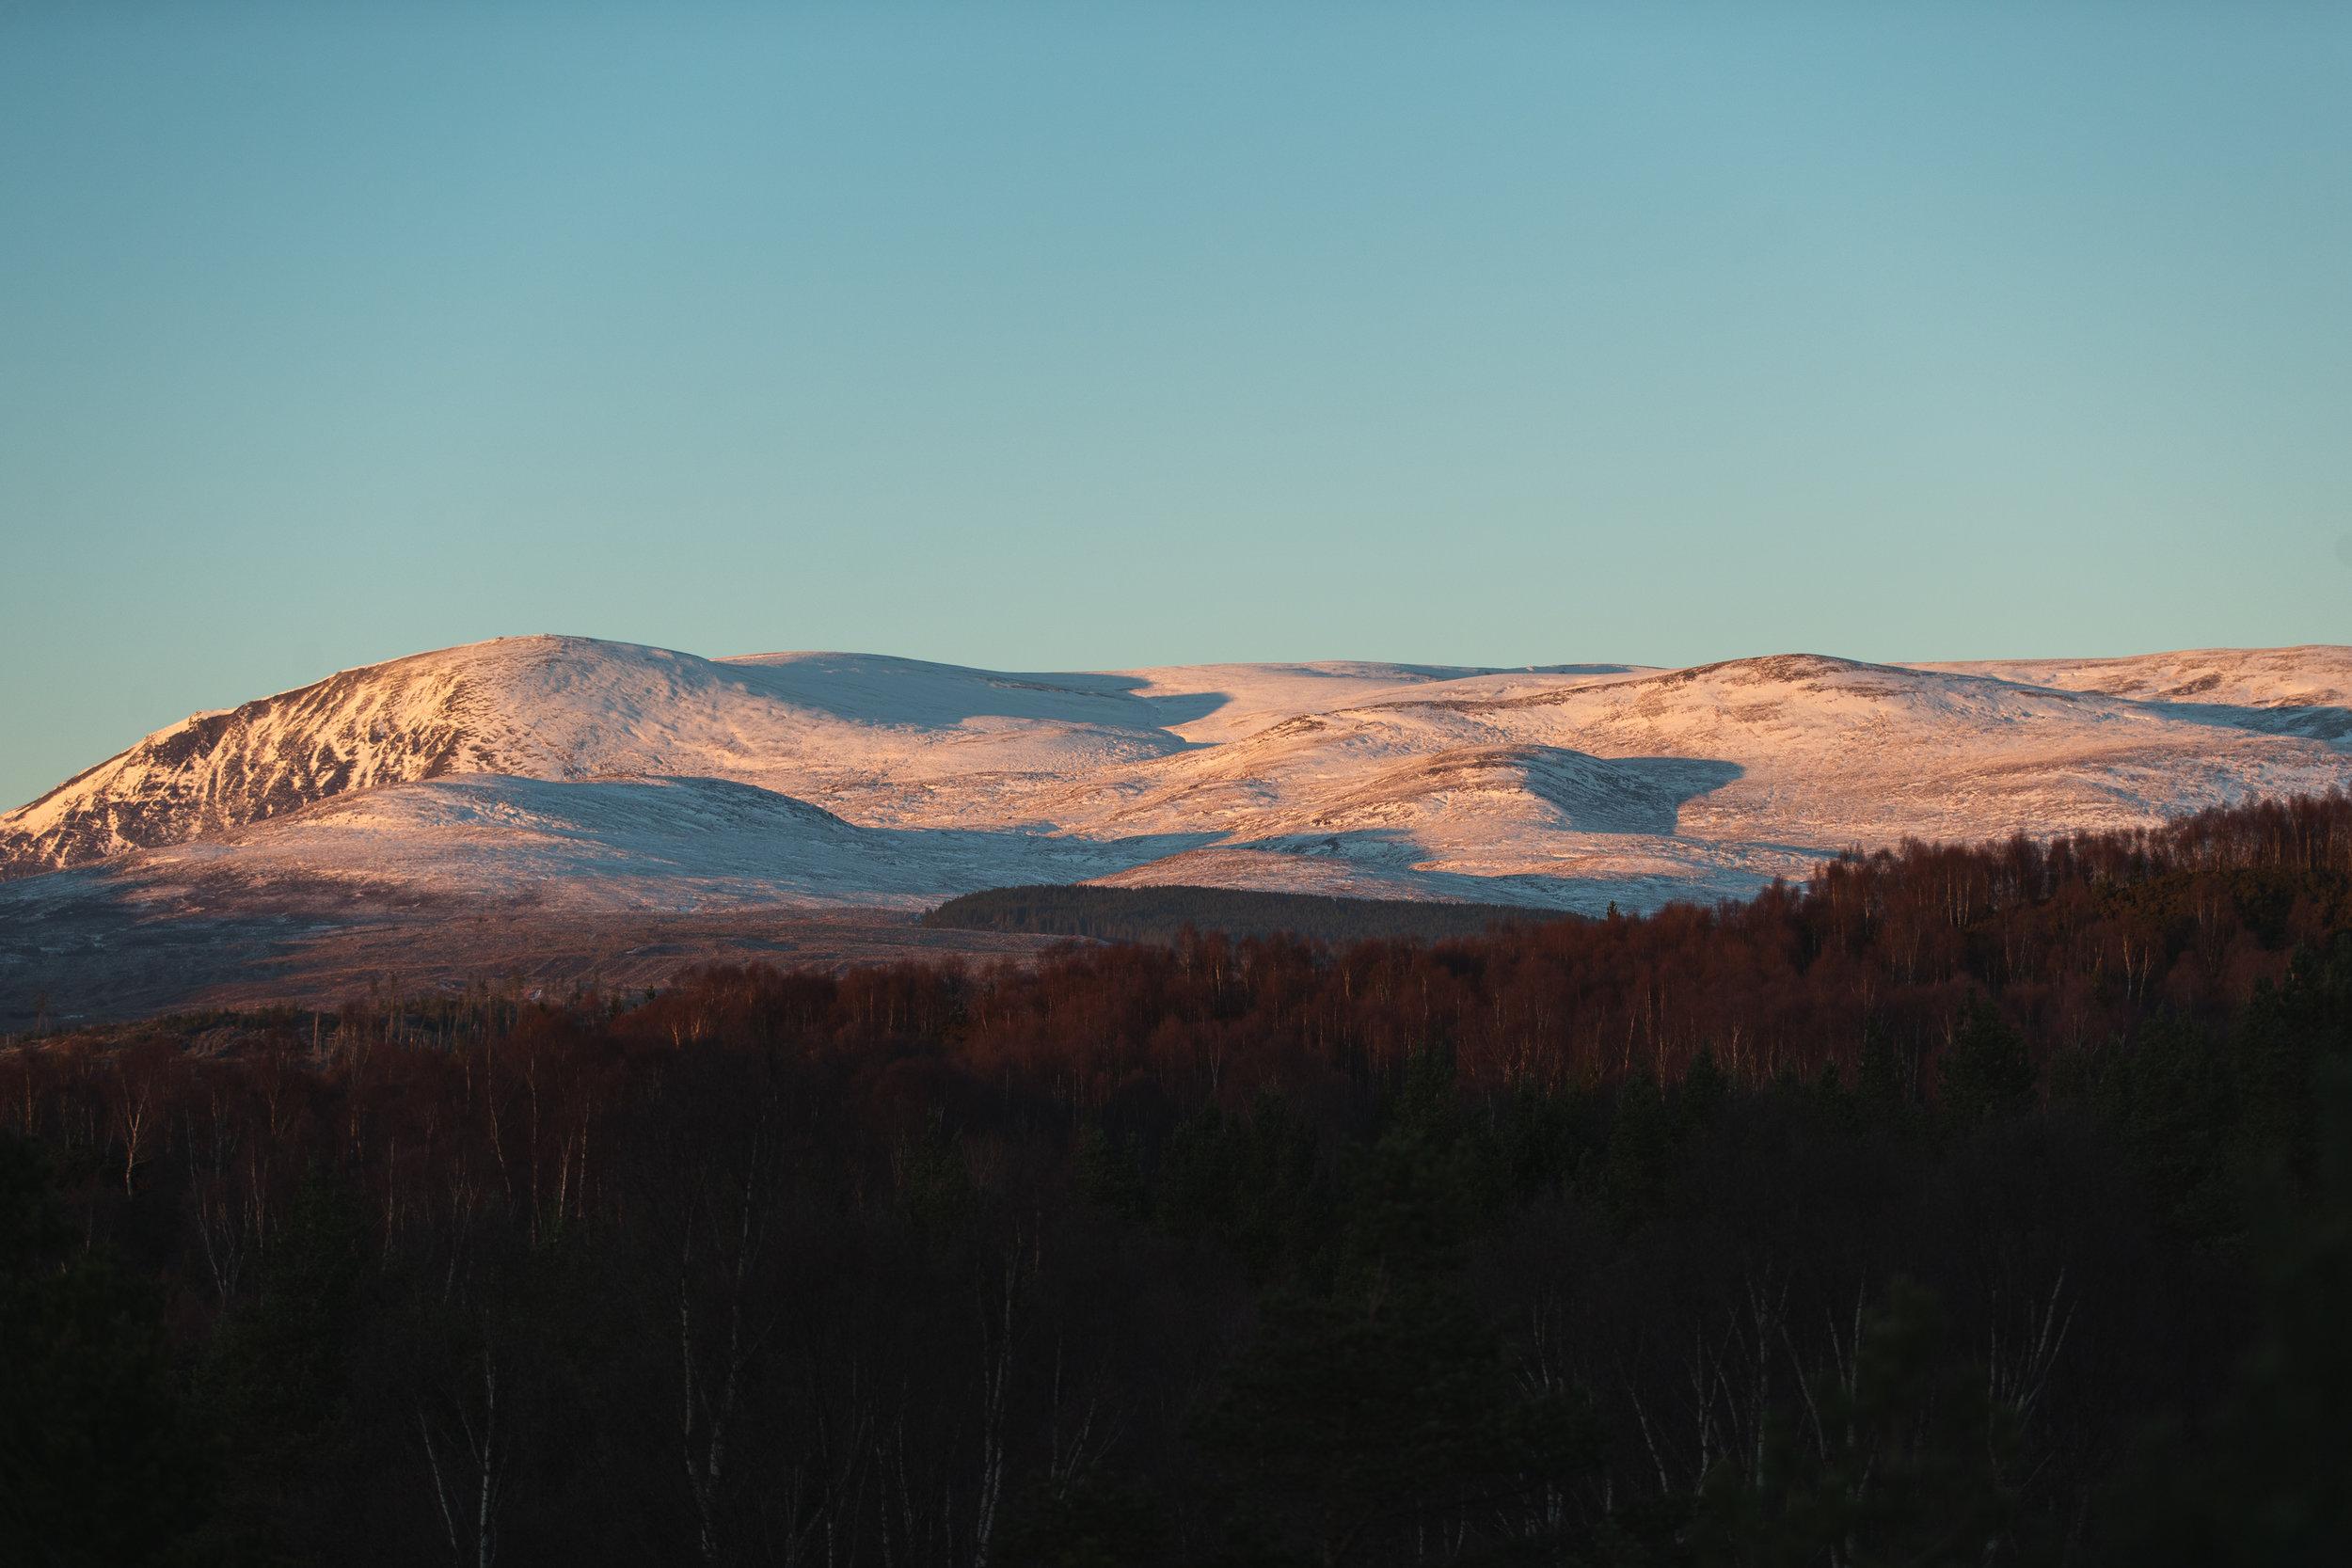 Mount-57-3.jpg